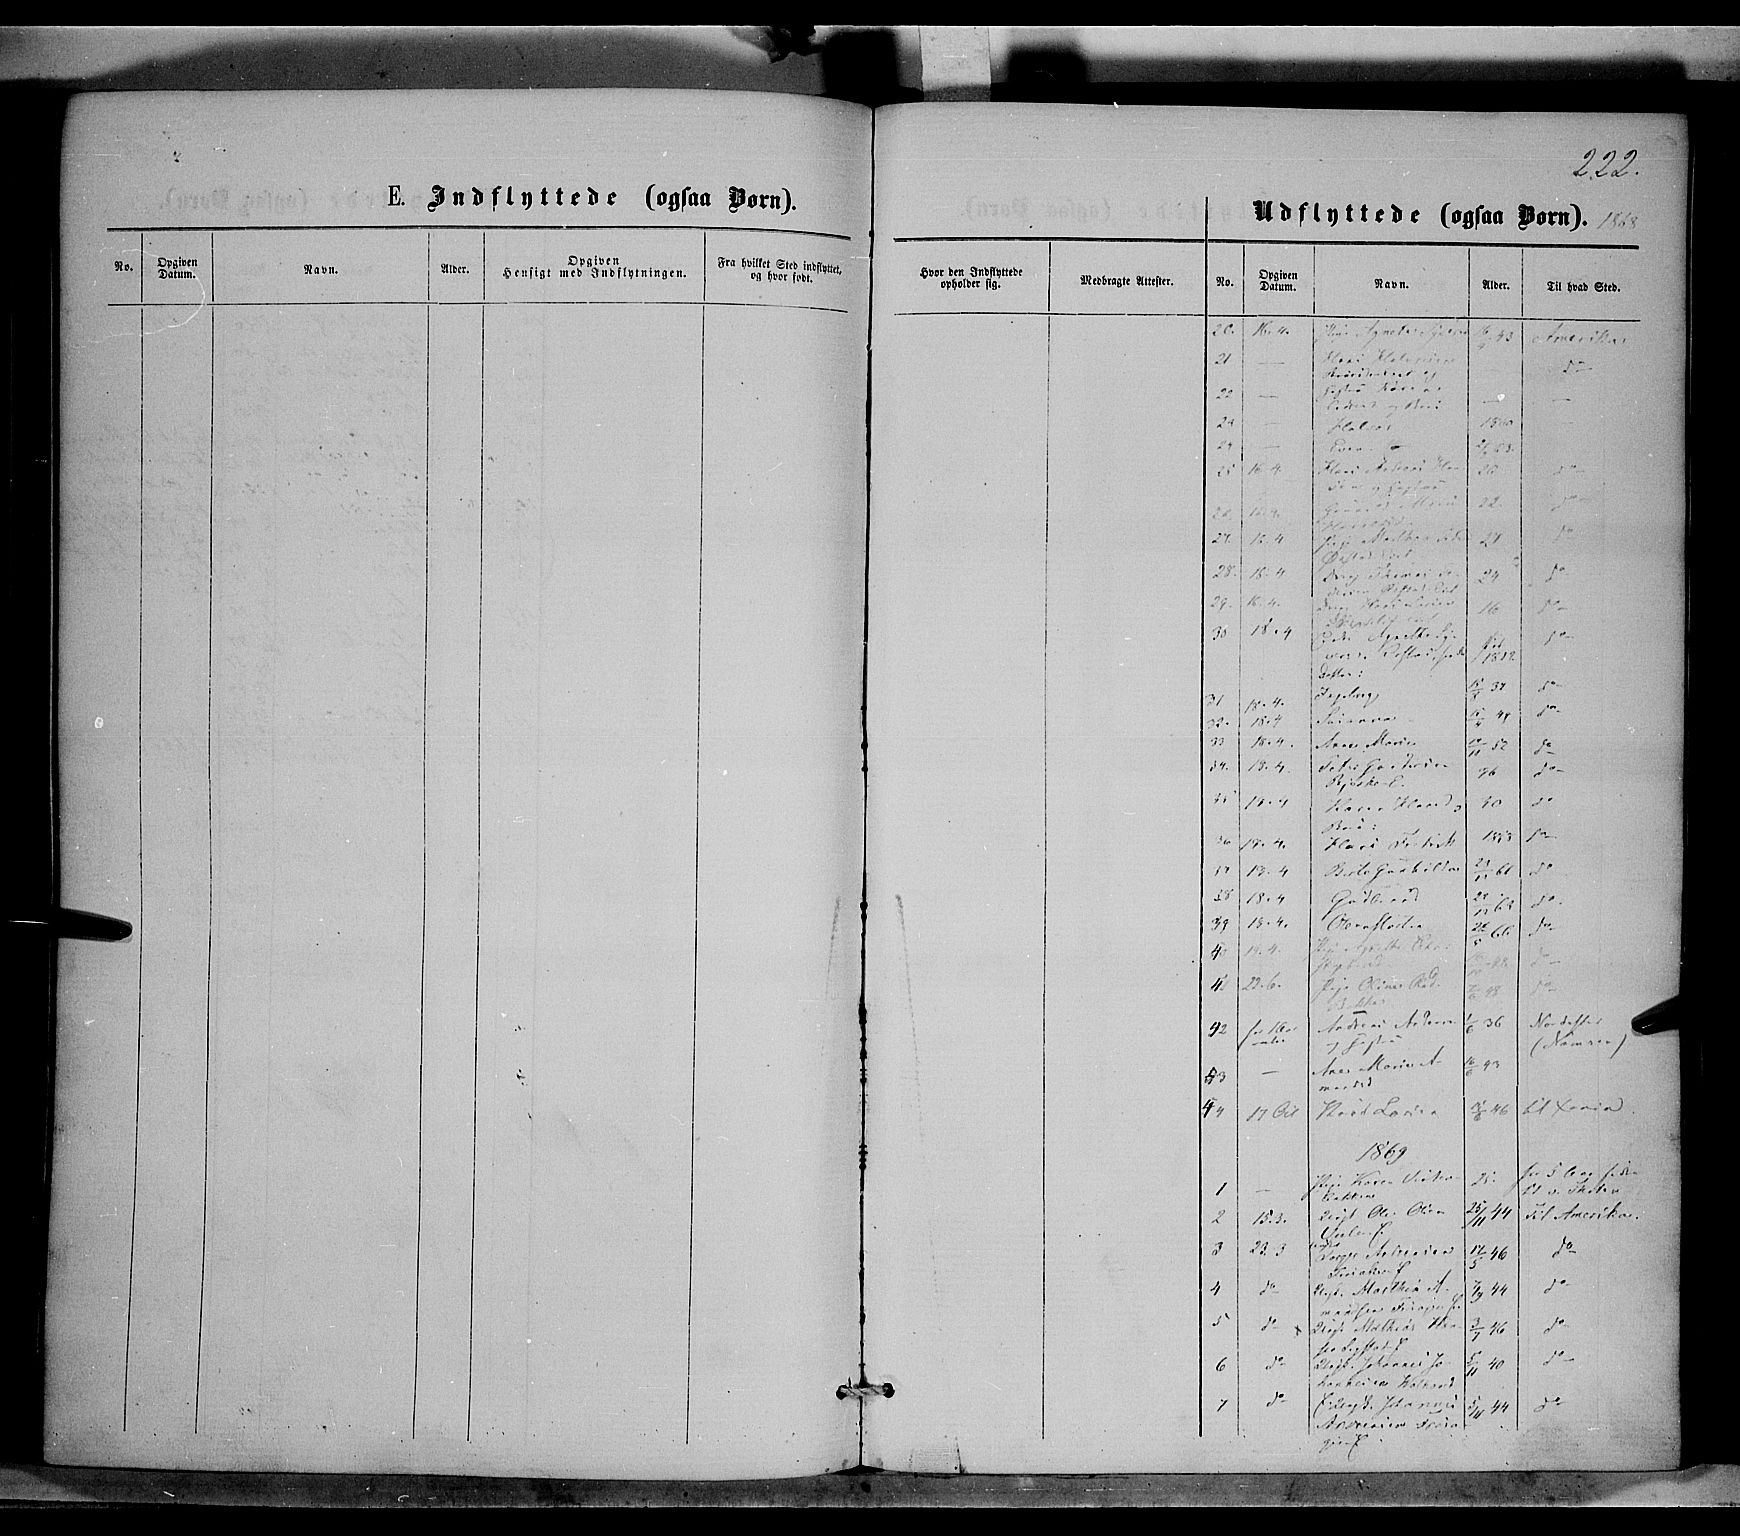 SAH, Nordre Land prestekontor, Ministerialbok nr. 1, 1860-1871, s. 222